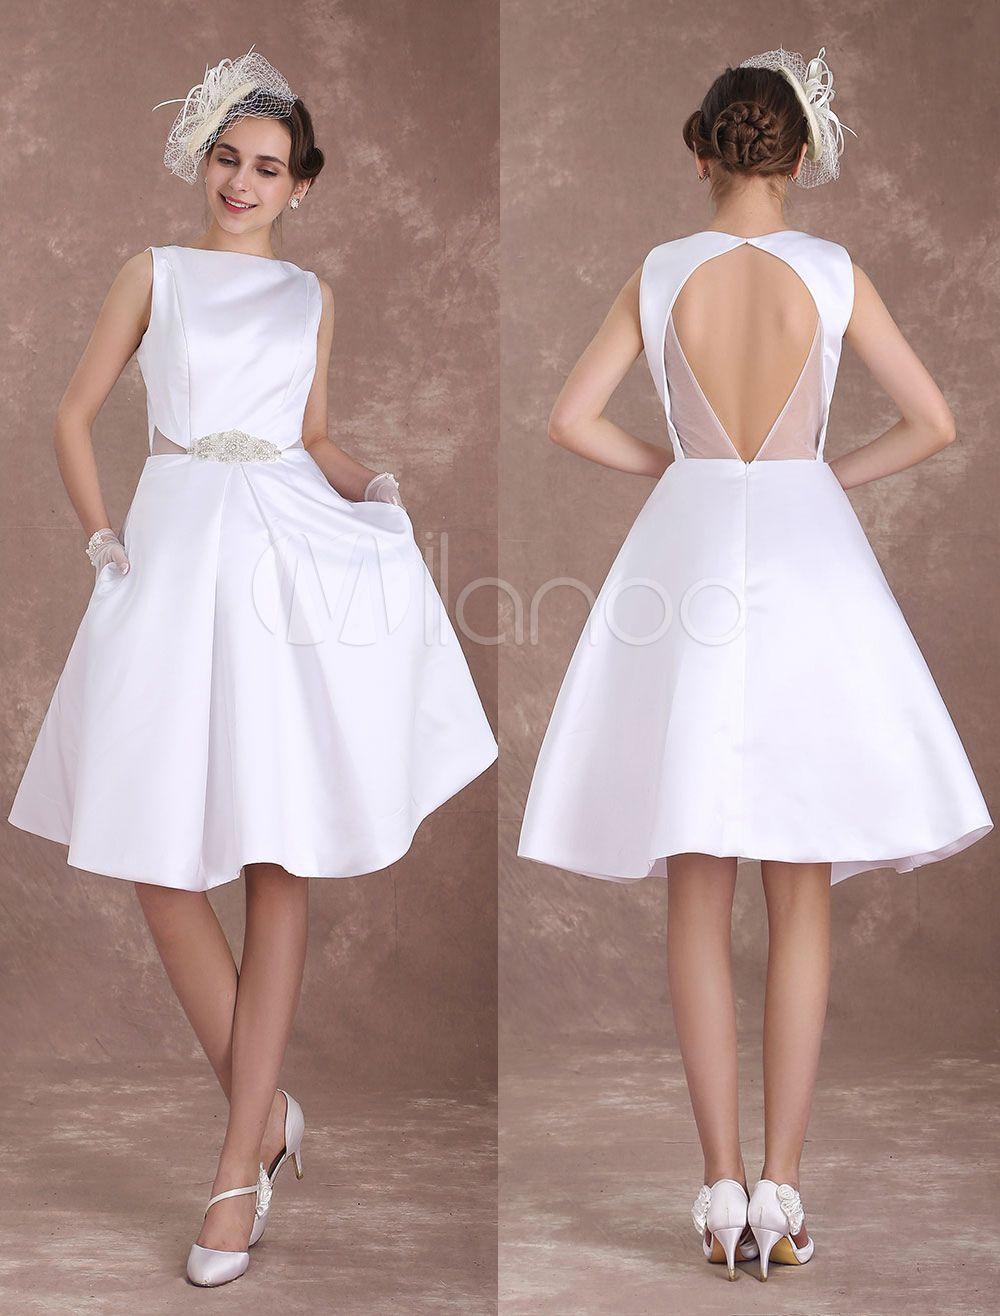 ac737e43518c White Wedding Dresses Short Bridal Dress Vintage 1950's Satin Backless  Bateau Beaded Knee Length Wedding Reception Dress Milanoo - Milanoo.com